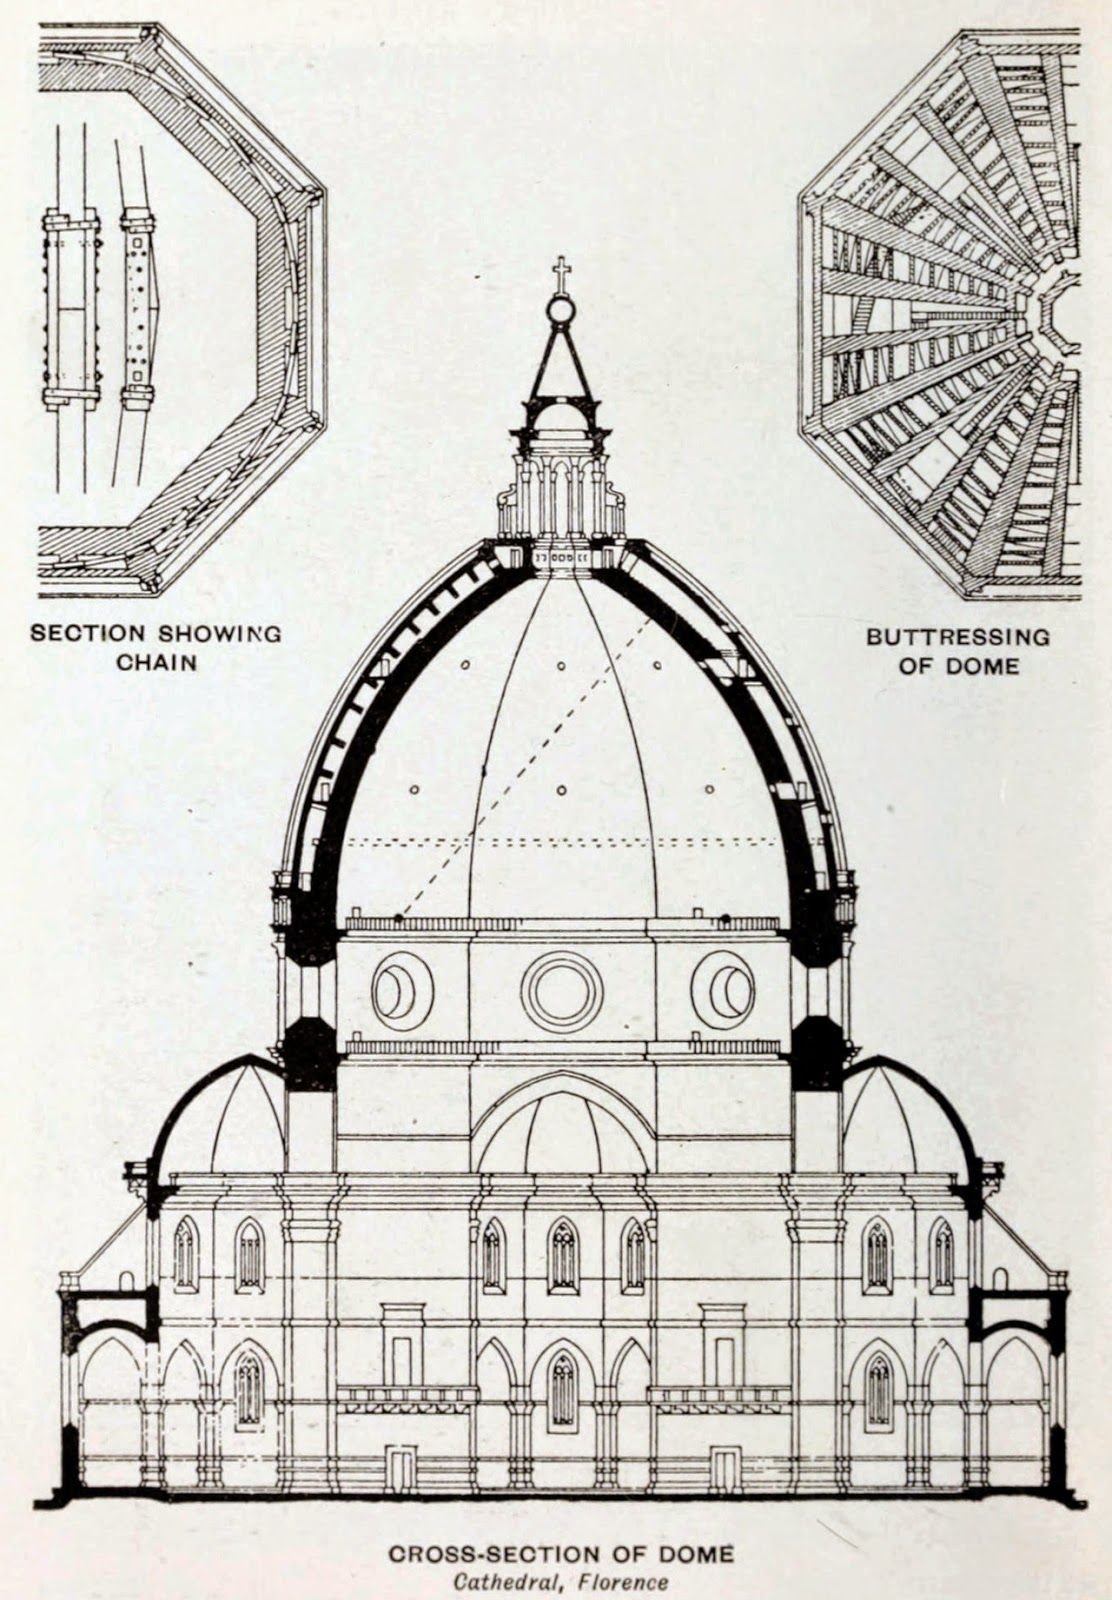 Sección De La Cúpula De La Catedrald E Florencia Brunelleschi Arquitectura Renacentista Renacimiento Arquitectura Arquitectura Antigua